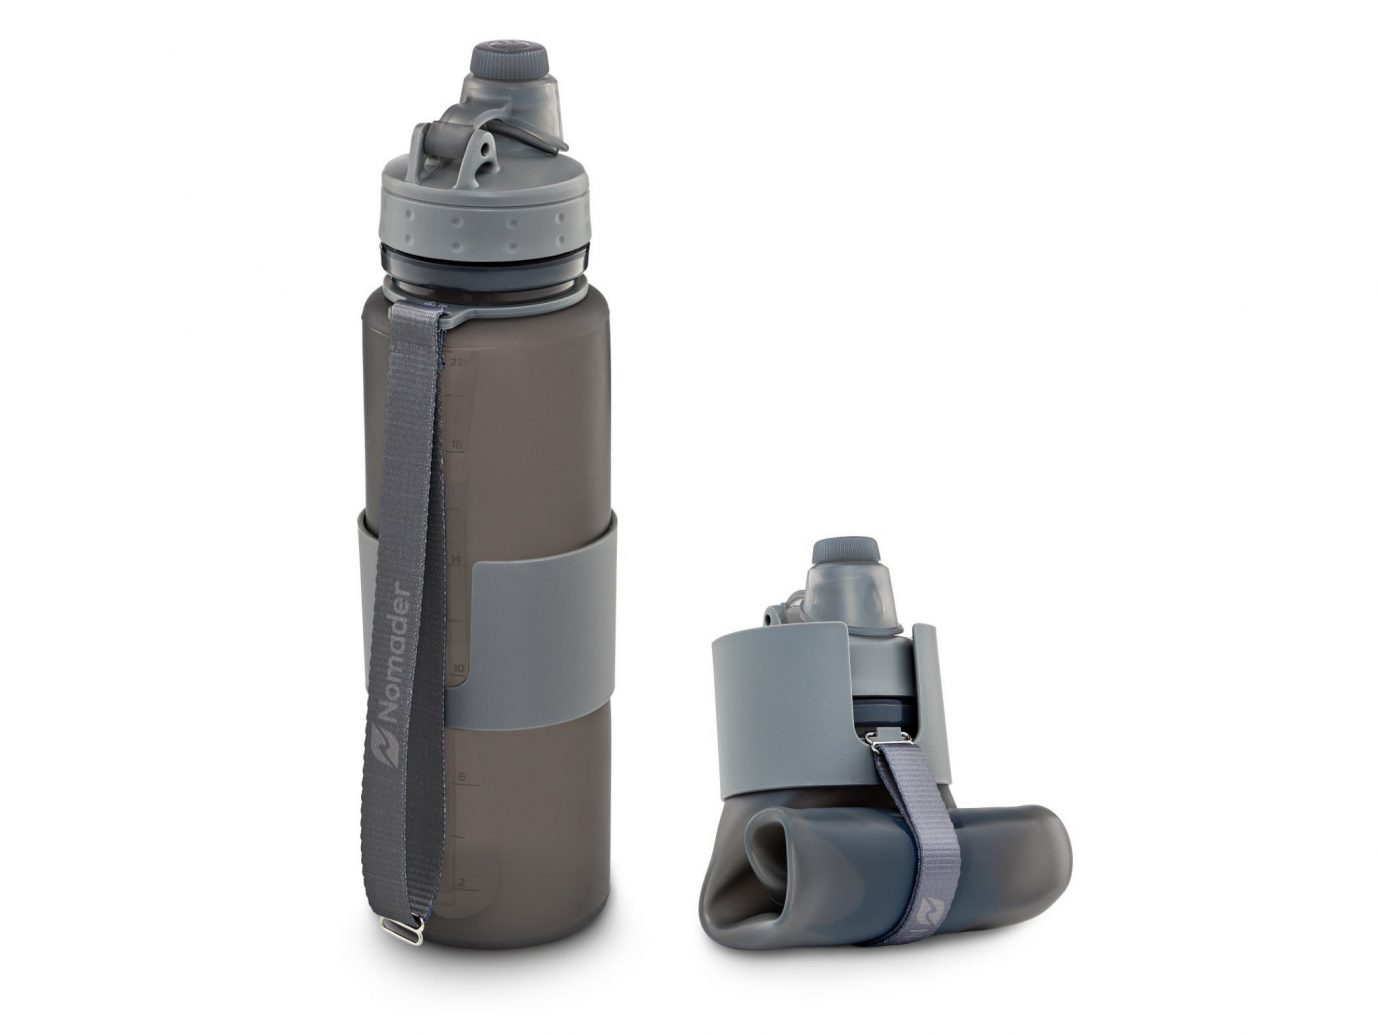 Travel Tips lighter product bottle optical instrument camera lens drinkware